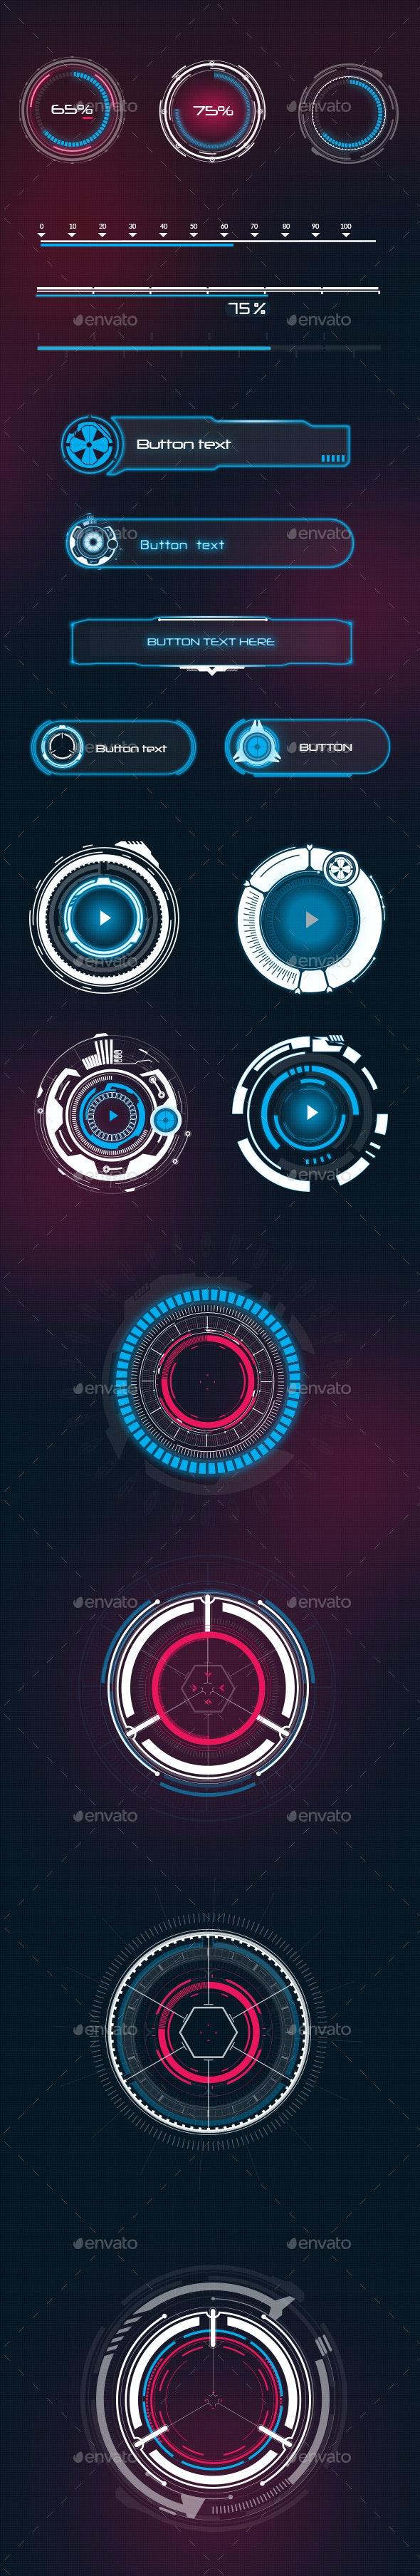 Futuristic Style Sci-Fi UI Elements - Miscellaneous Game Assets